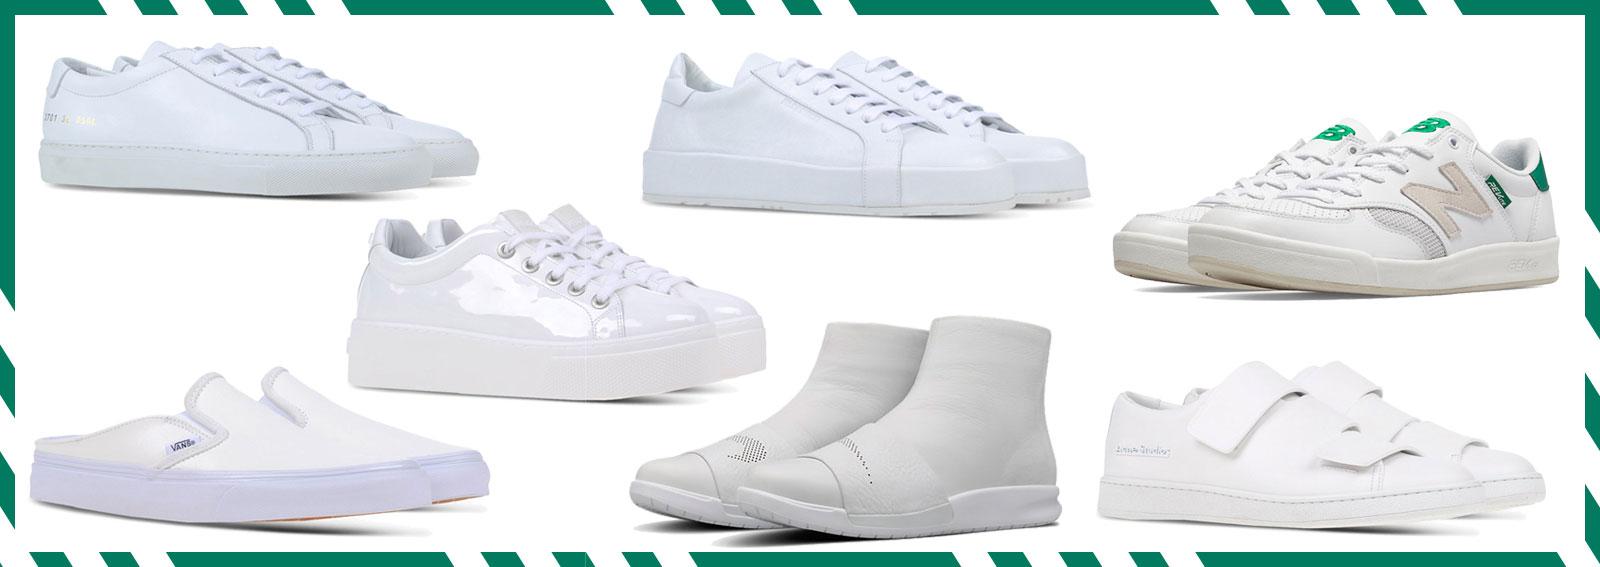 cover sneakers bianche desktop